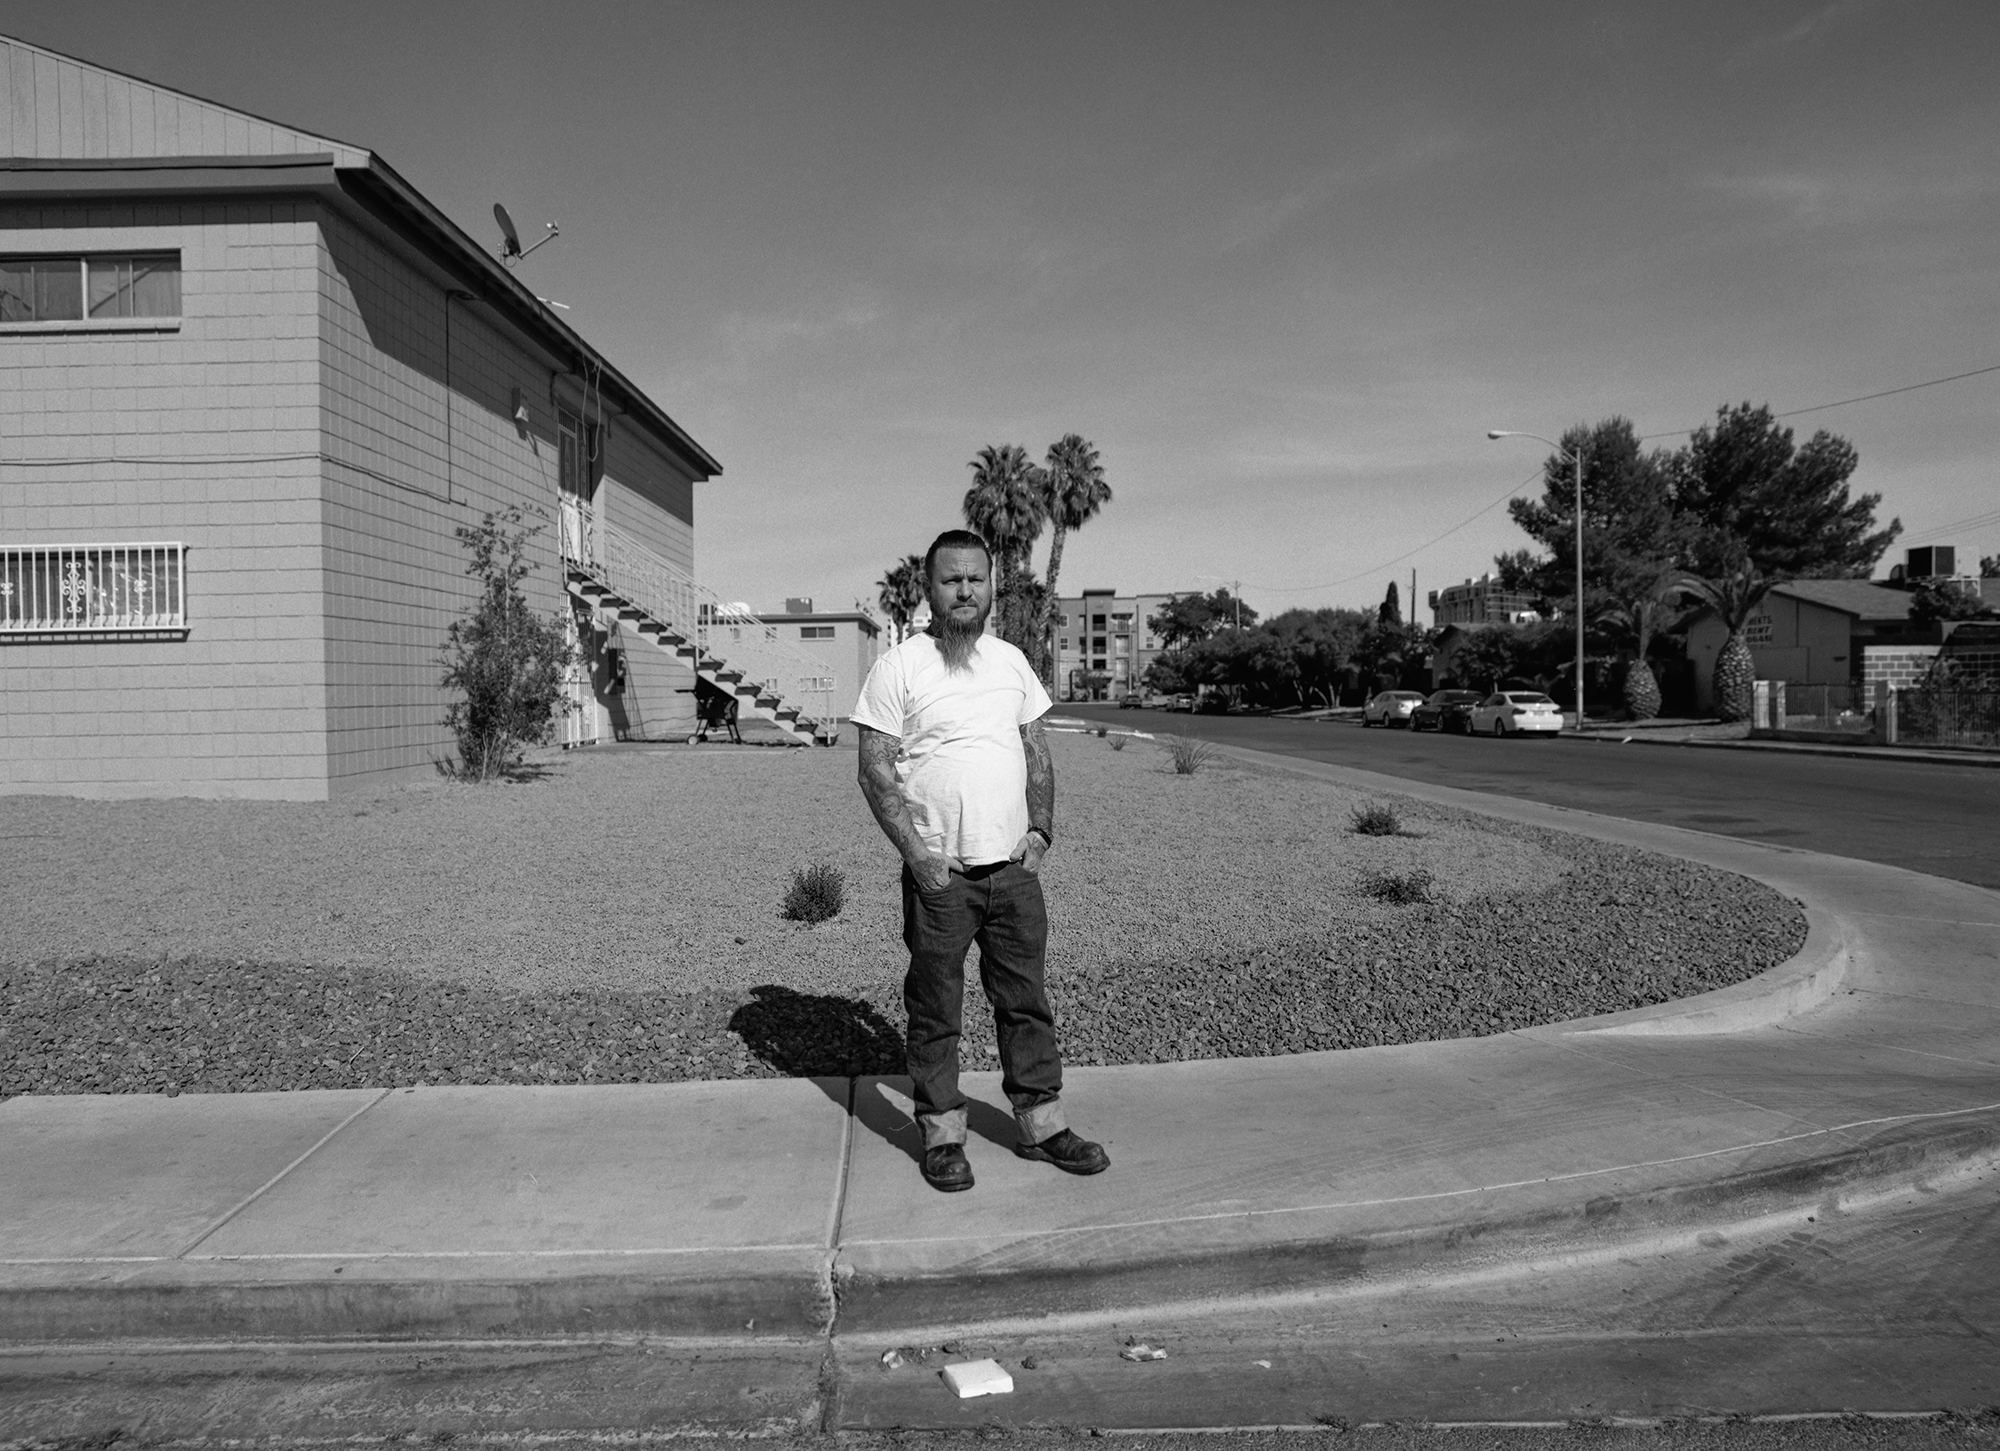 Las Vegas, Nevada |April 2016 {Scanned 120mm B&W Film Negative}